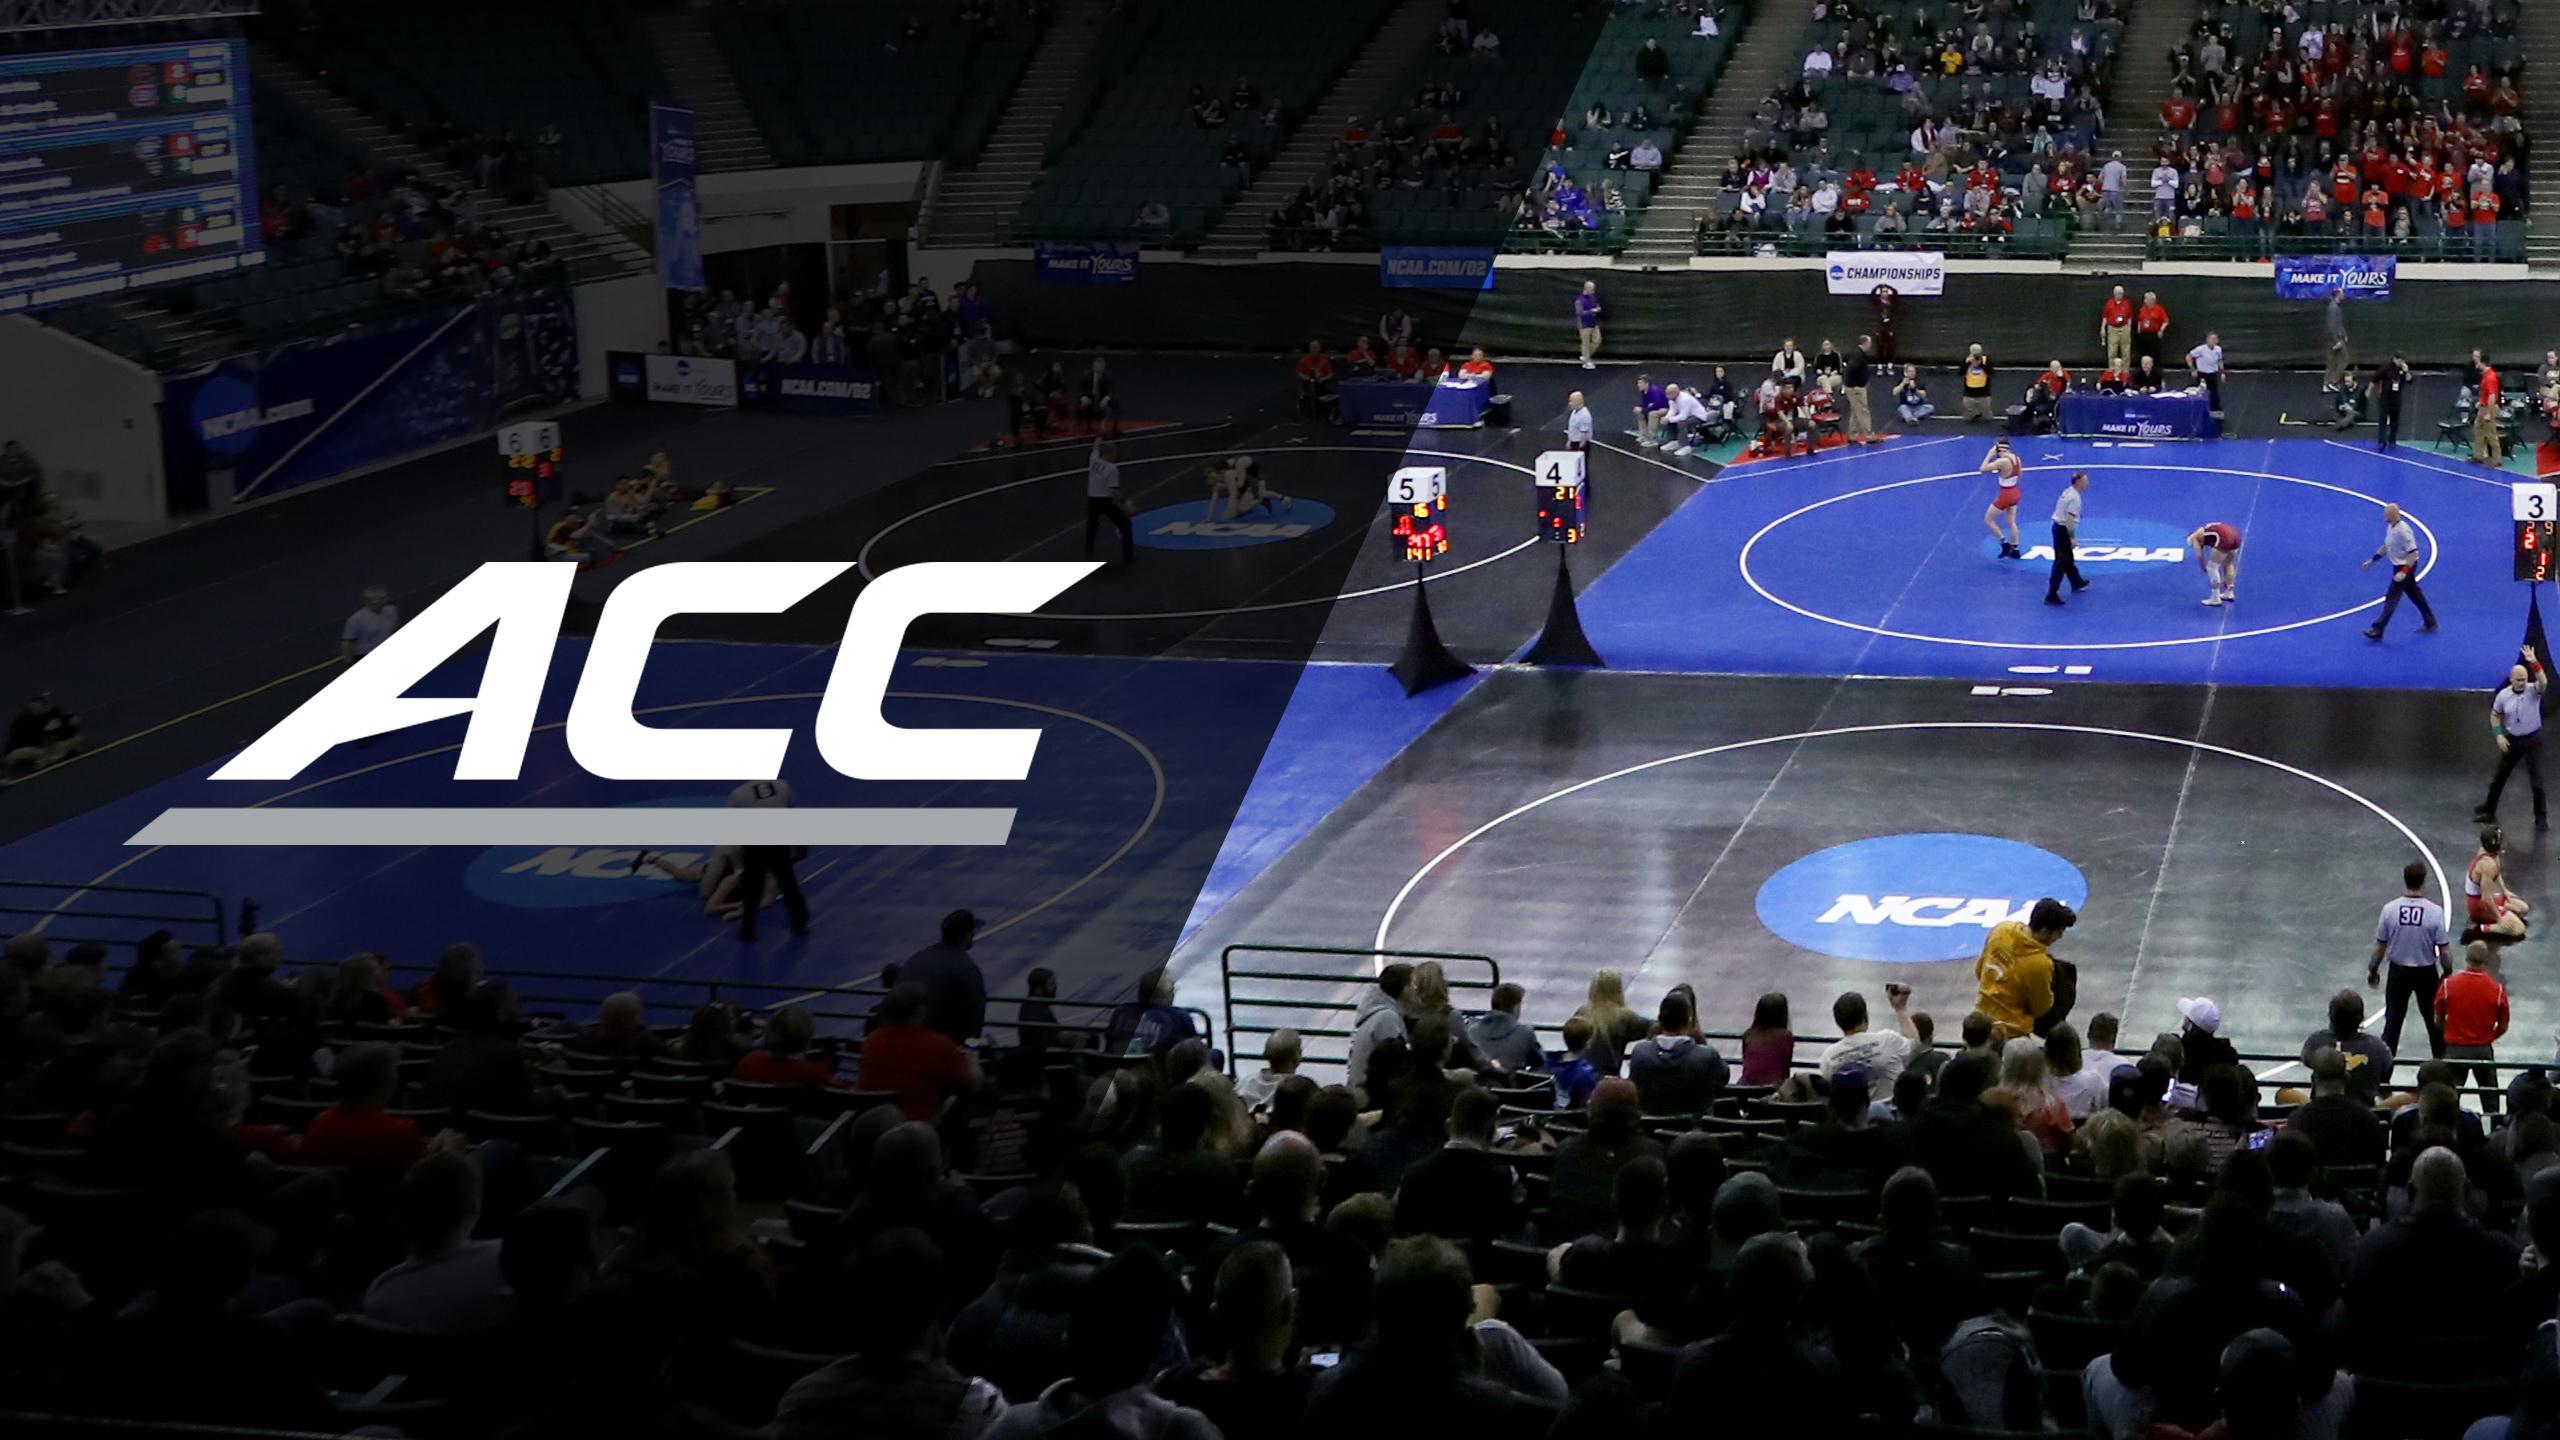 ACC Wrestling Championship - Mat 1 (Championship)